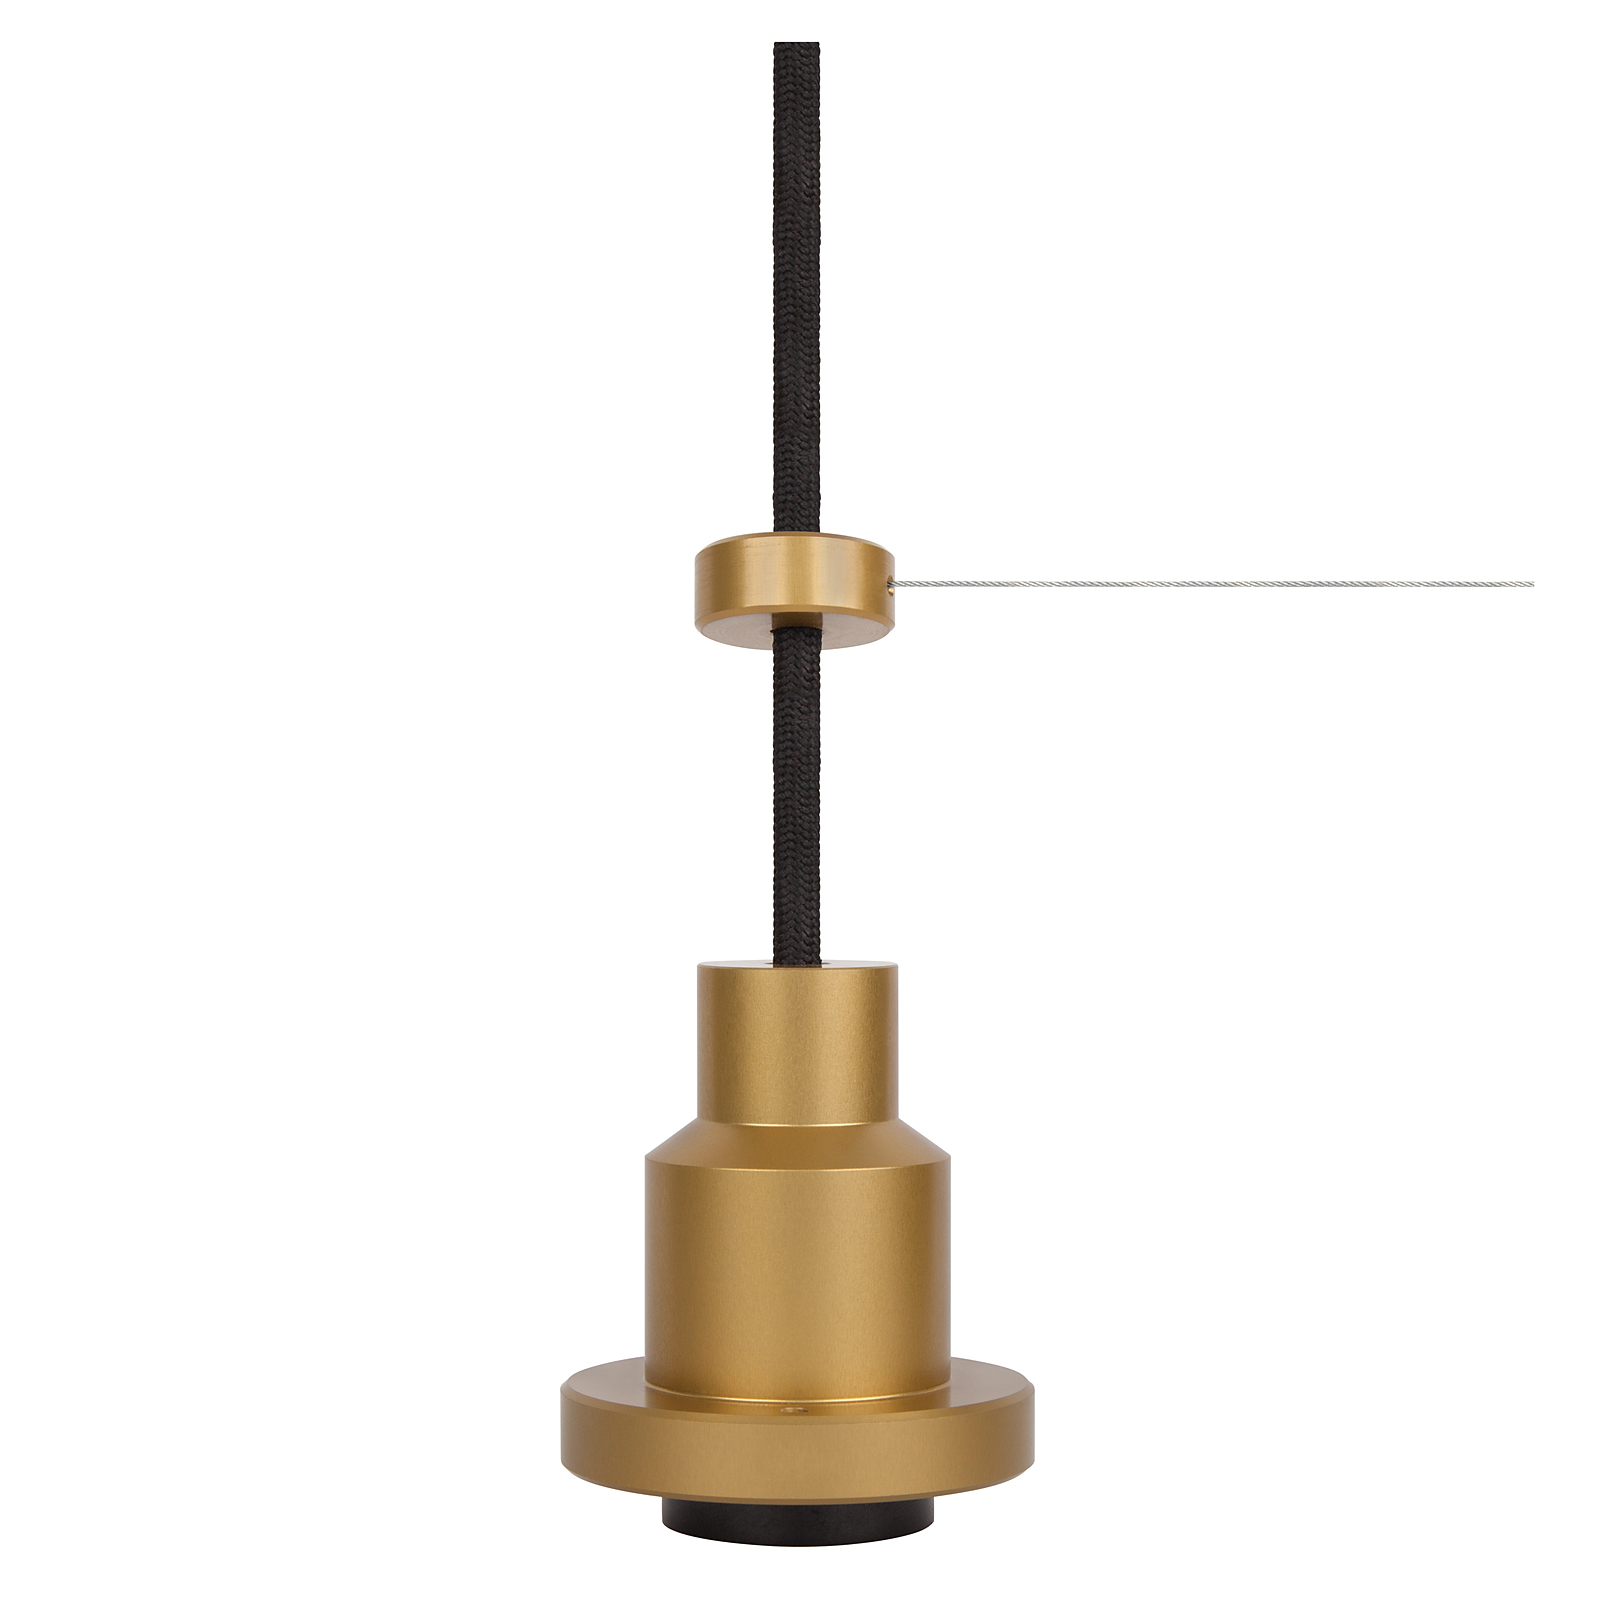 osram pendulum fassung mit kabel f r retro filament led lampen gold. Black Bedroom Furniture Sets. Home Design Ideas